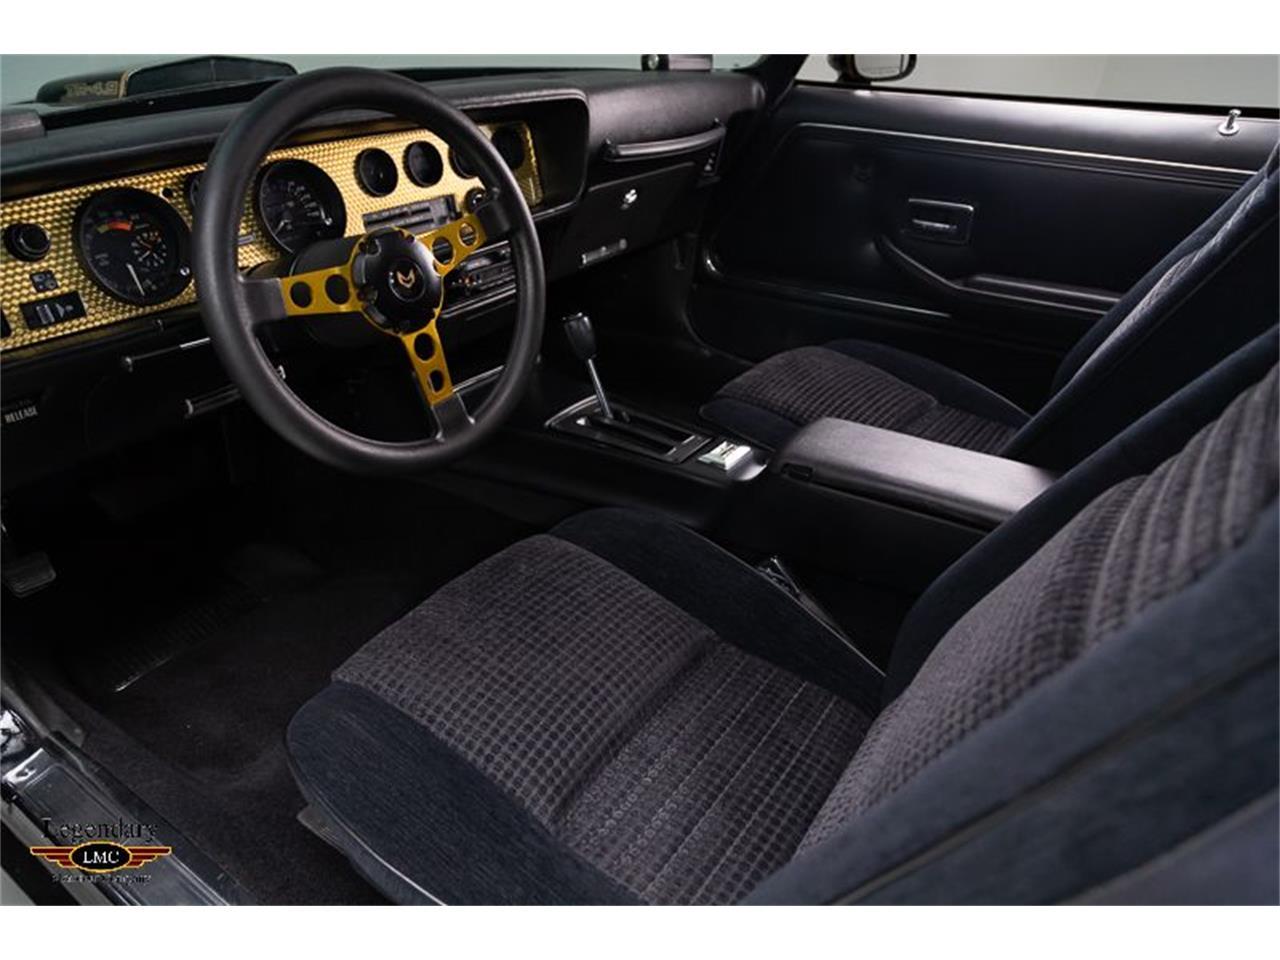 1980 Pontiac Firebird Trans Am (CC-1356944) for sale in Halton Hills, Ontario